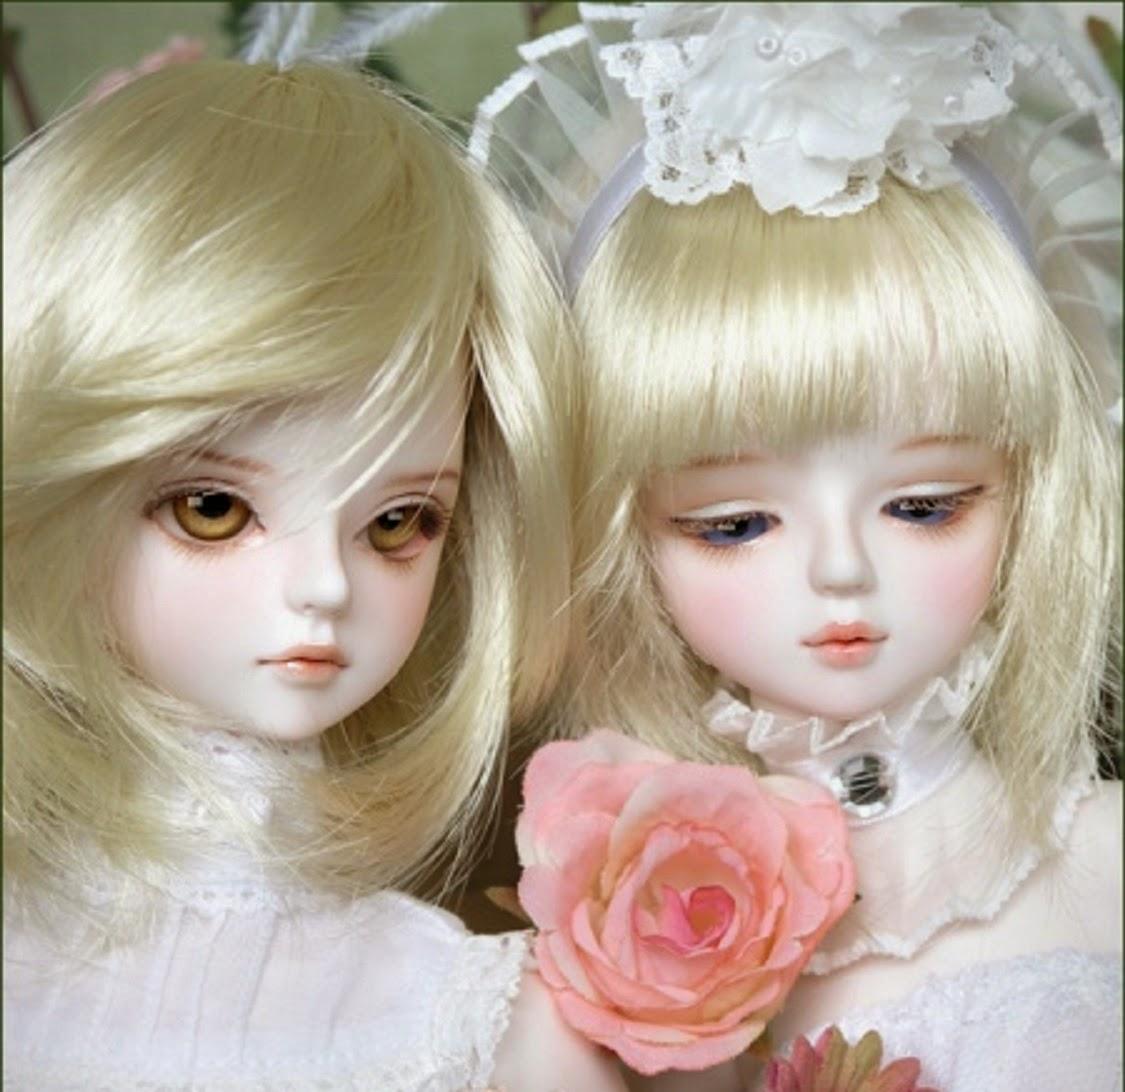 Barbie Wallpaper Hd 3d: Chimney Bells: FreeCute Twins Barbie Dolls HD Wallpaper